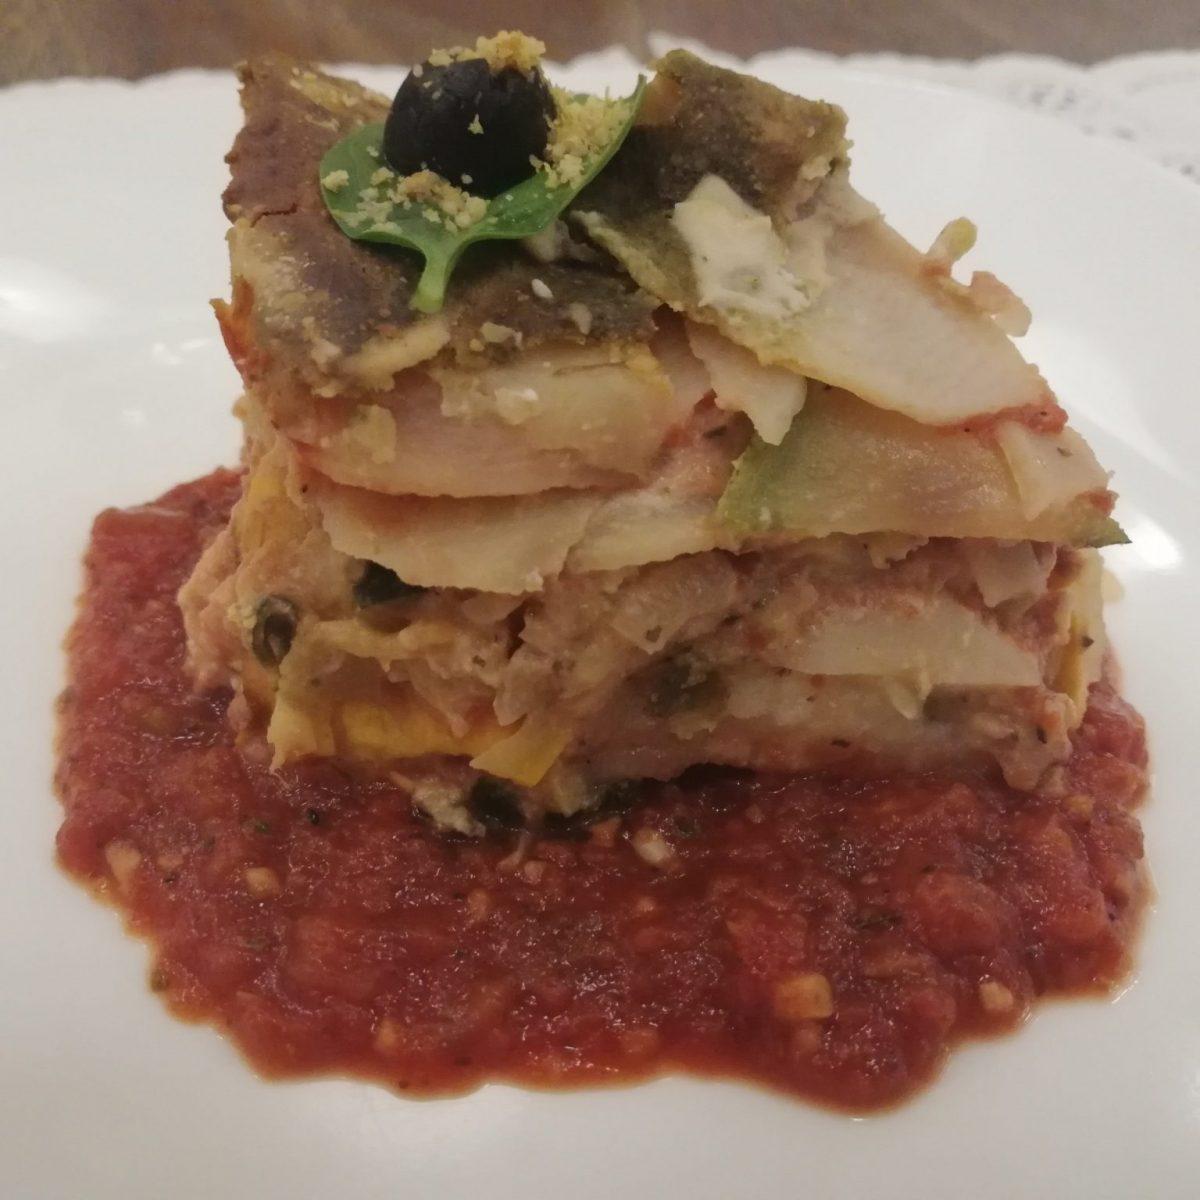 Pasta-free lasagna at JustBe Café